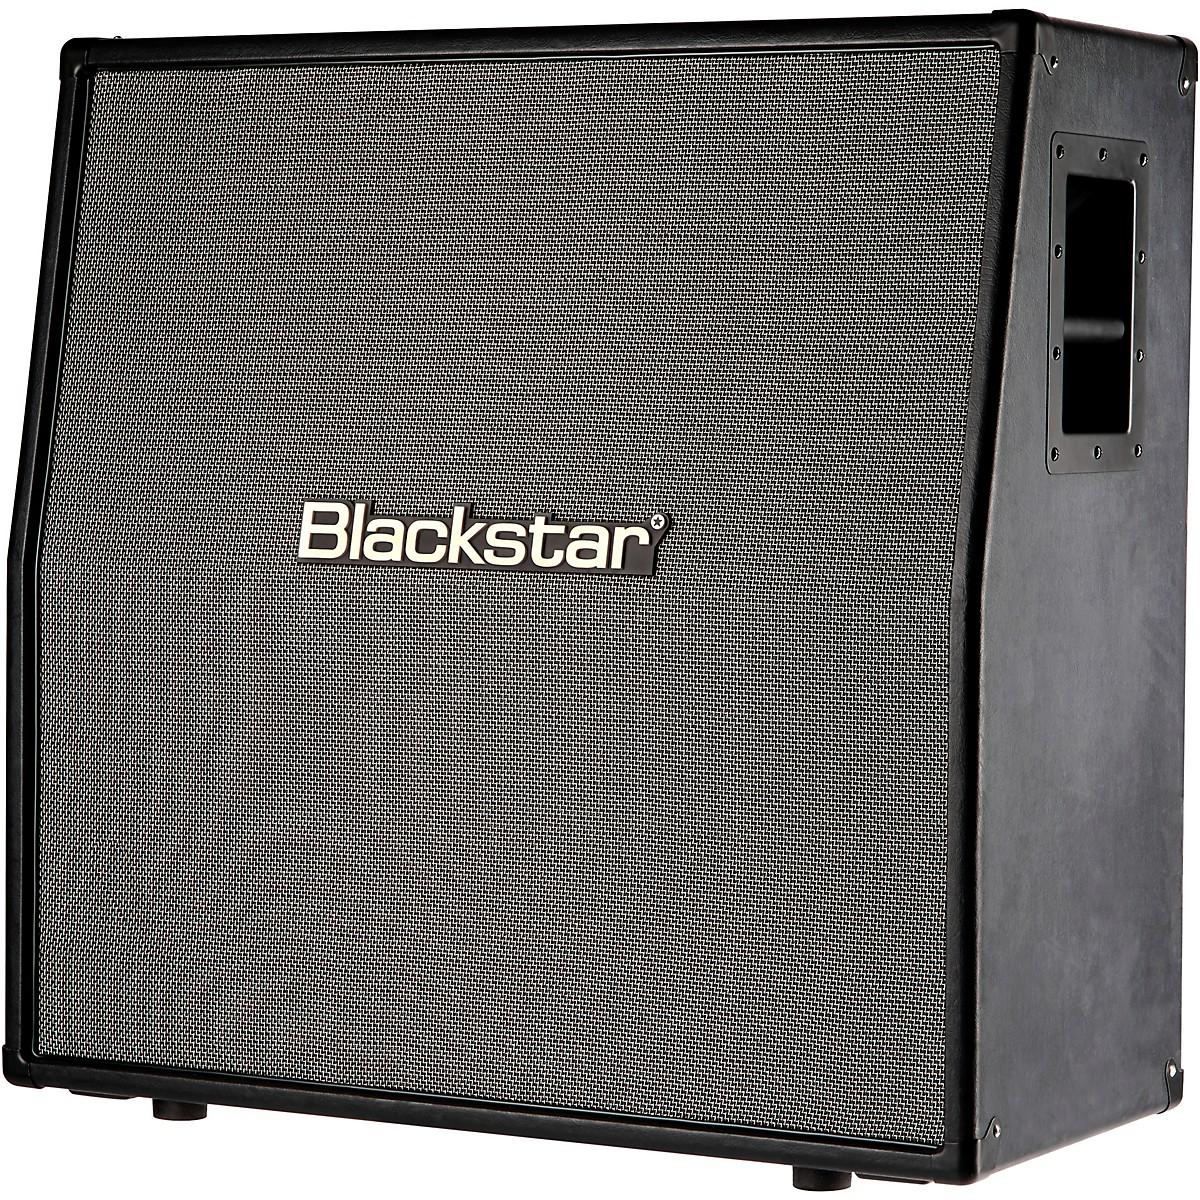 Blackstar HTV412A MKII HT Venue Series 320W 4x12 Angled Guitar Speaker Cabinet